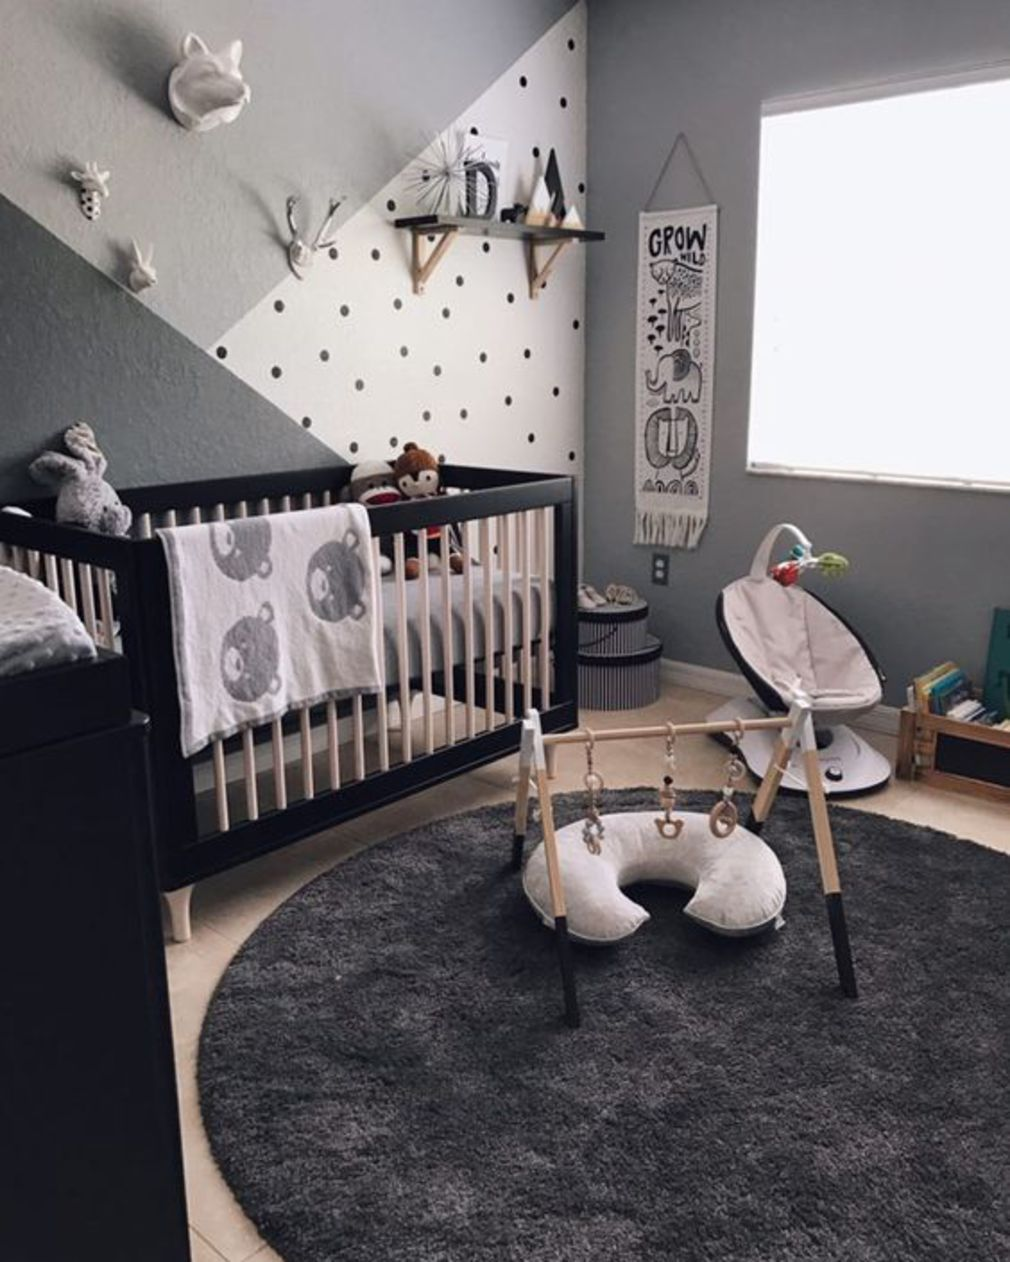 La chambre de bébé cosy - Les plus belles chambres de bébé